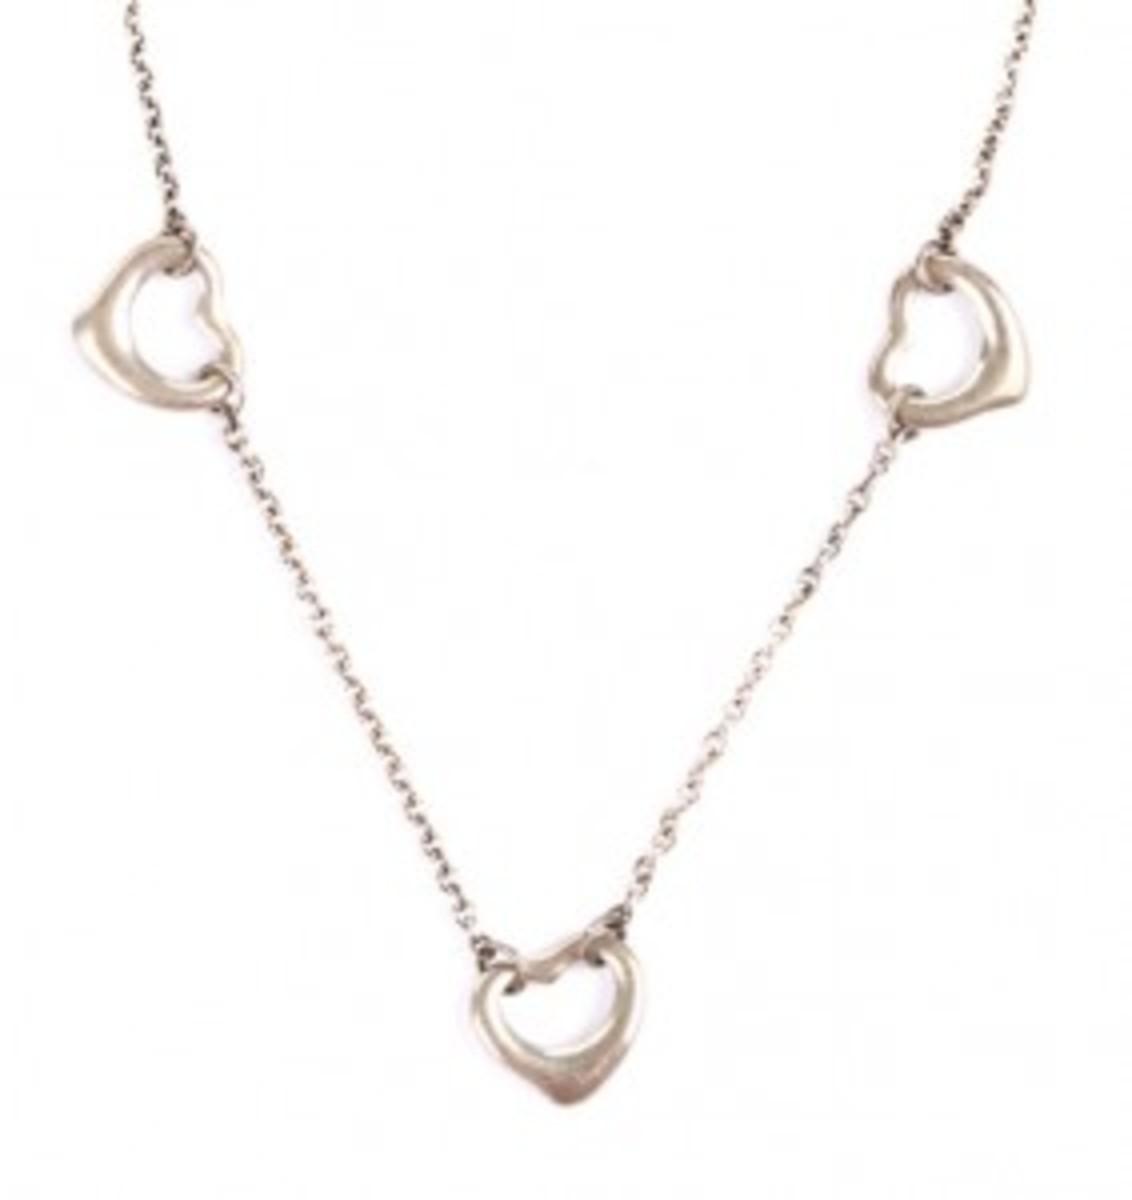 Tiffany and Peretti necklace